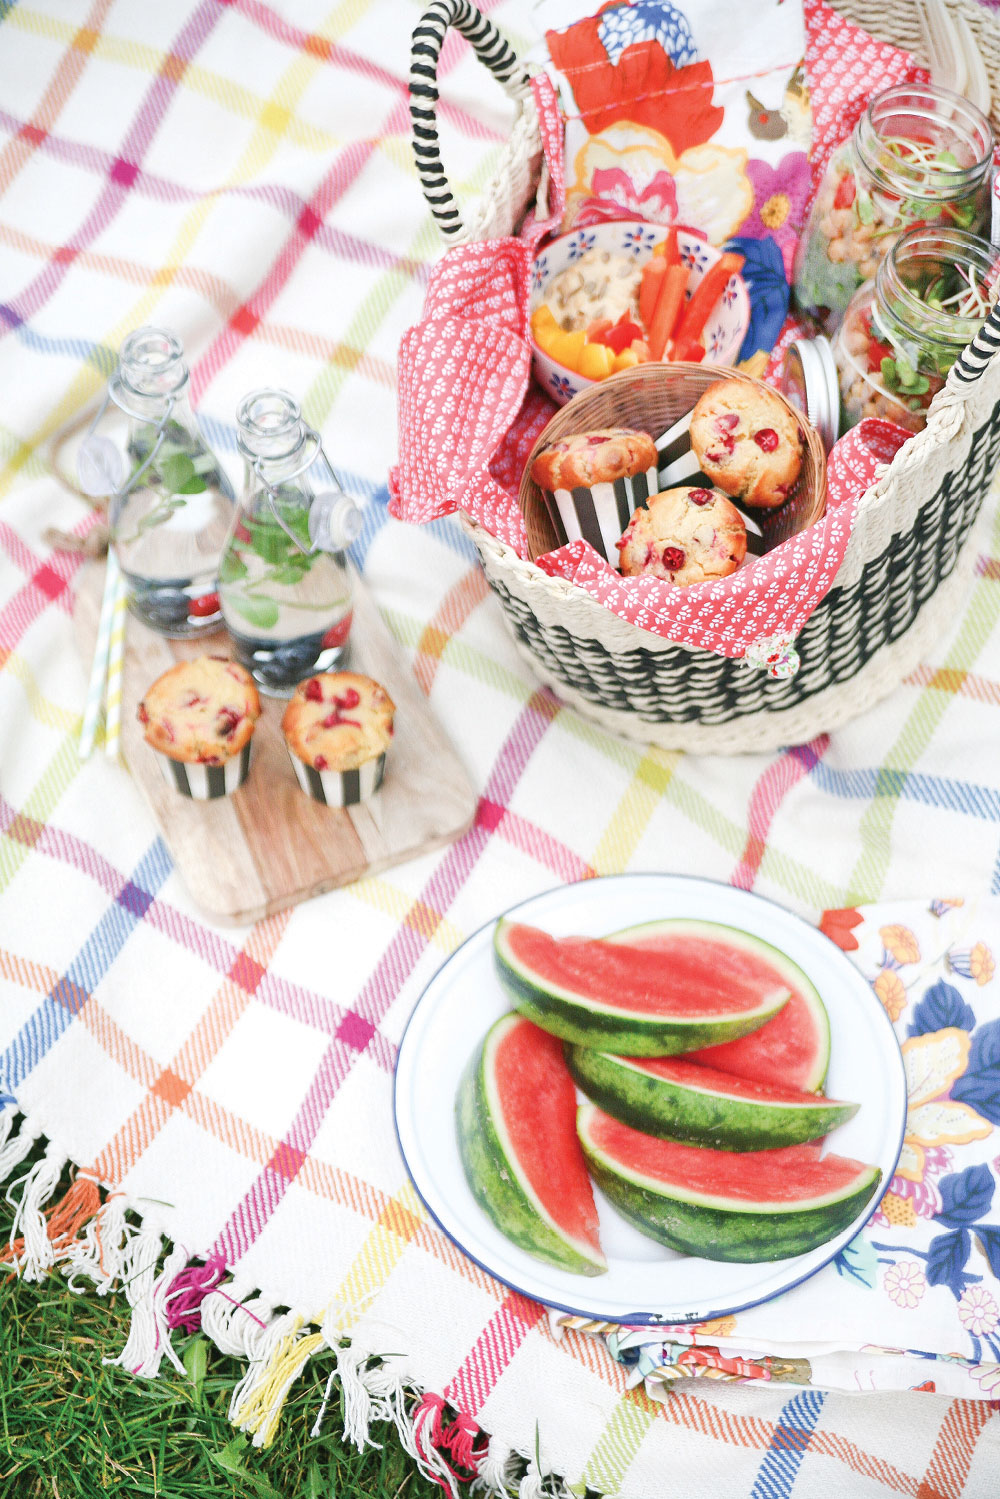 Gluten-Free-Vegan-Cranberry-Lemon-Muffins-Pure-Ella-Leche4